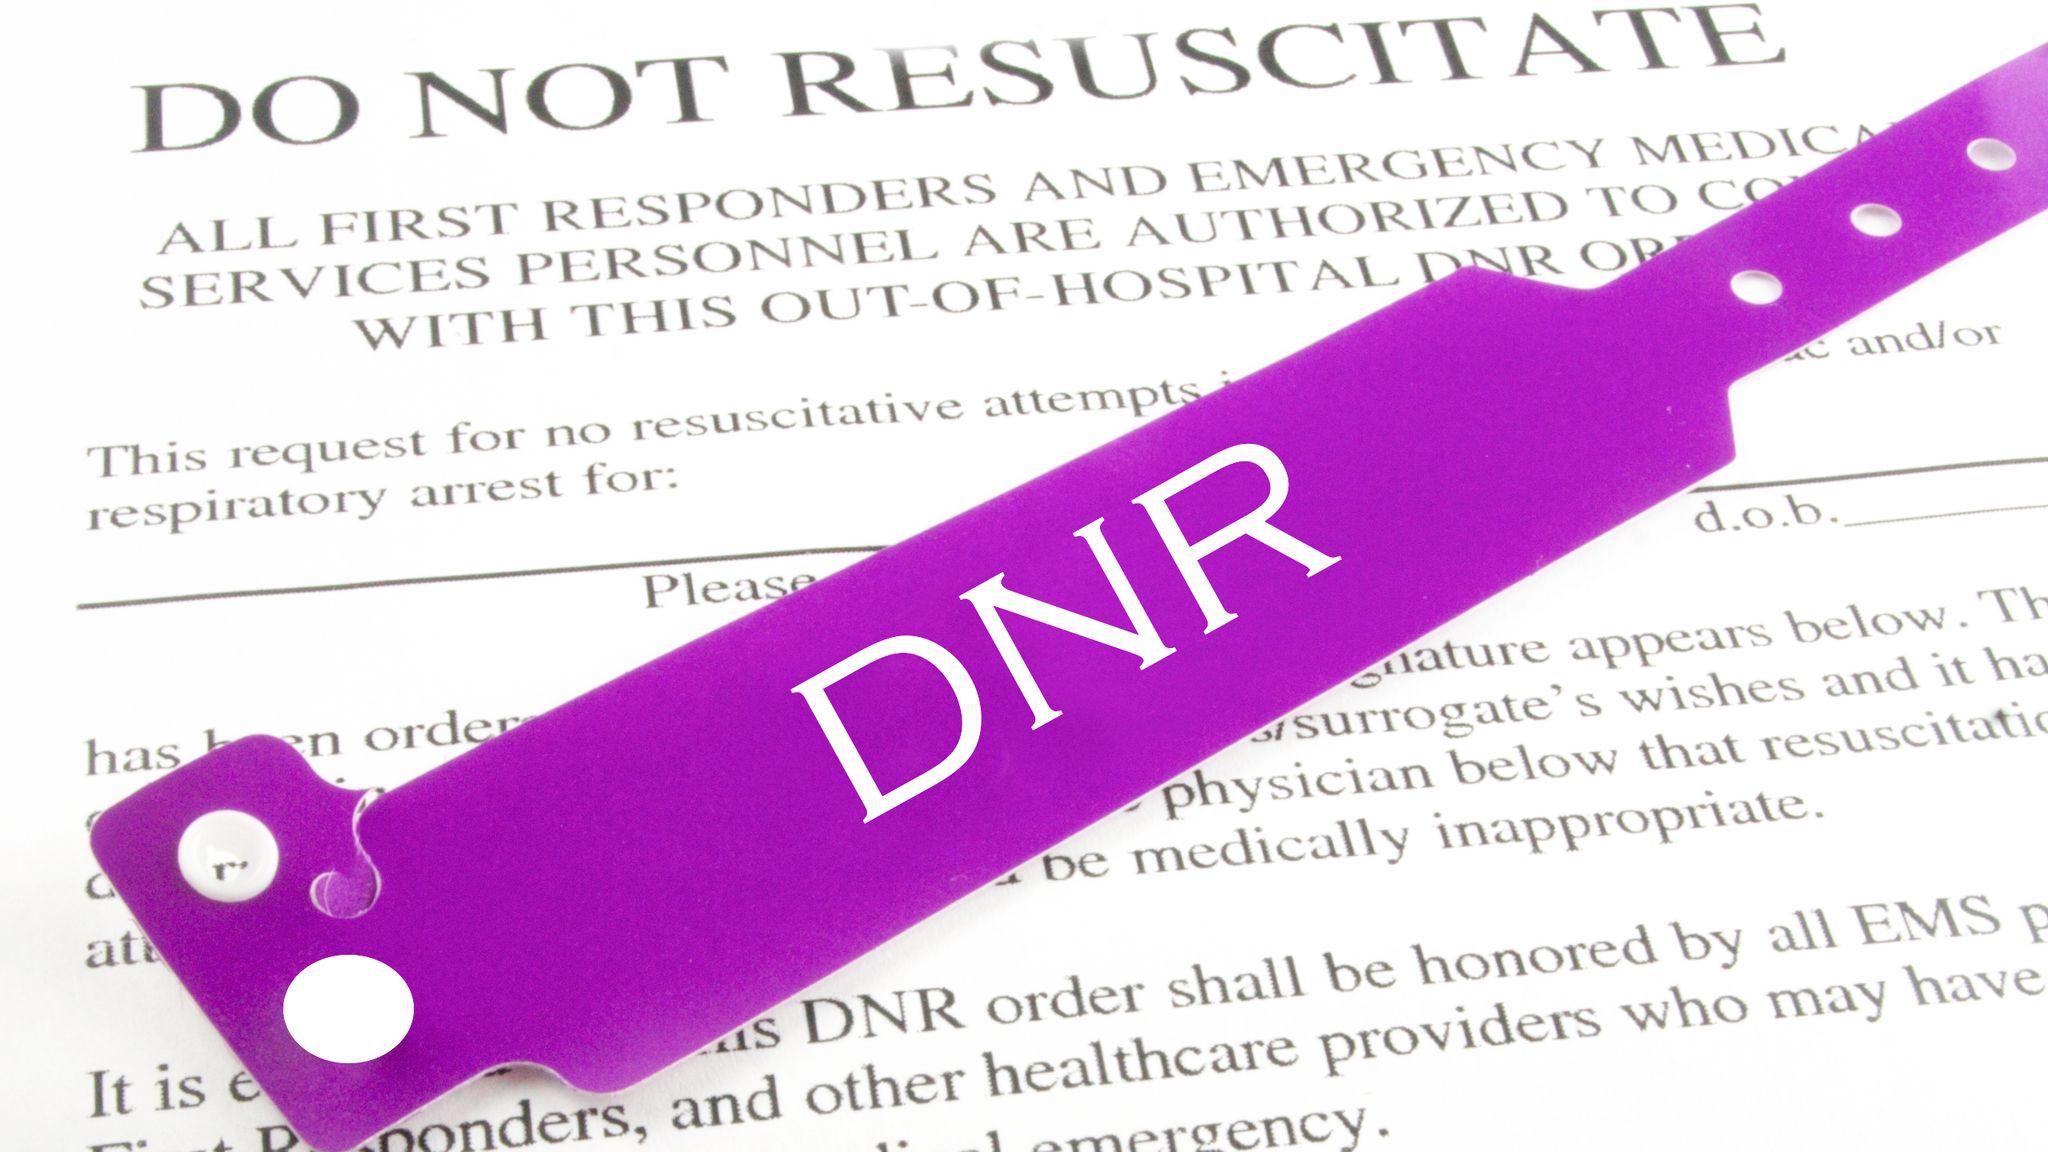 illegal-dnrs,-ventilators-&-involuntary-euthanasia